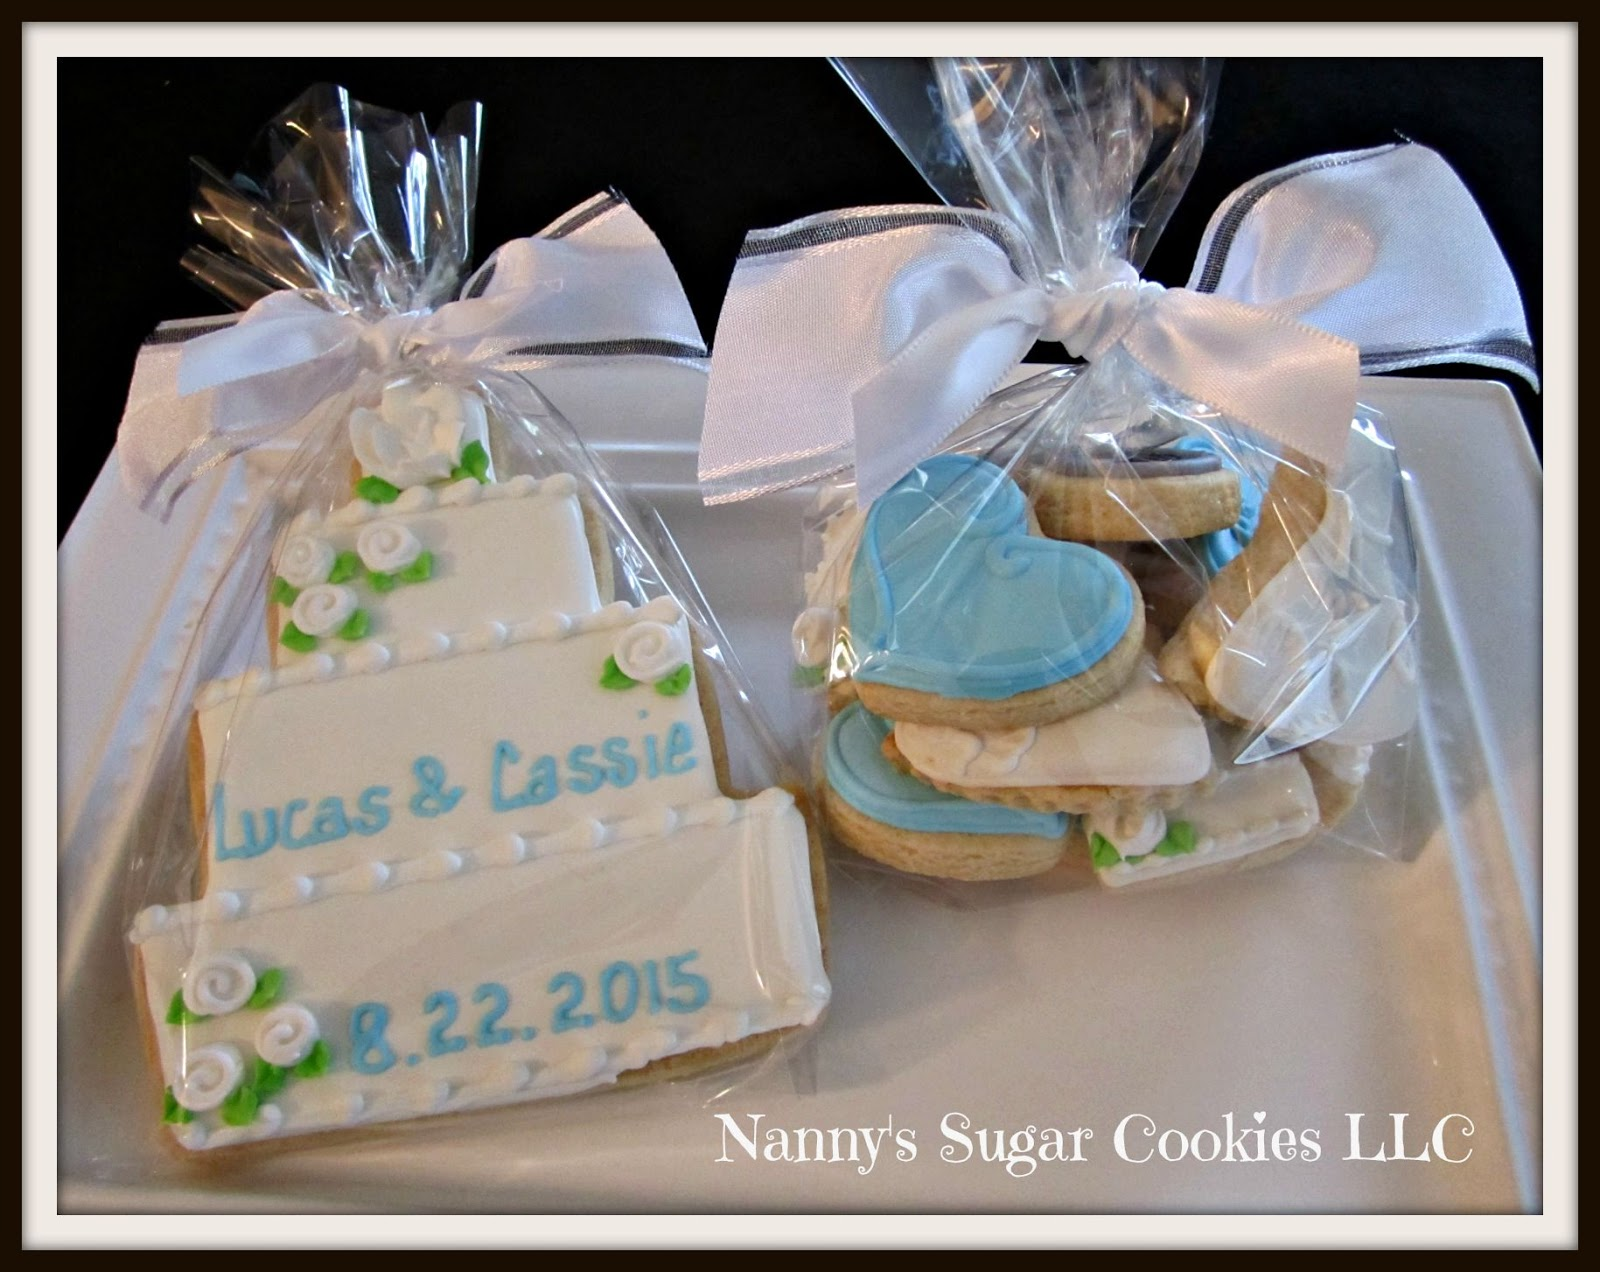 Nannys Sugar Cookies Llc Wedding Theme Cookie Favors